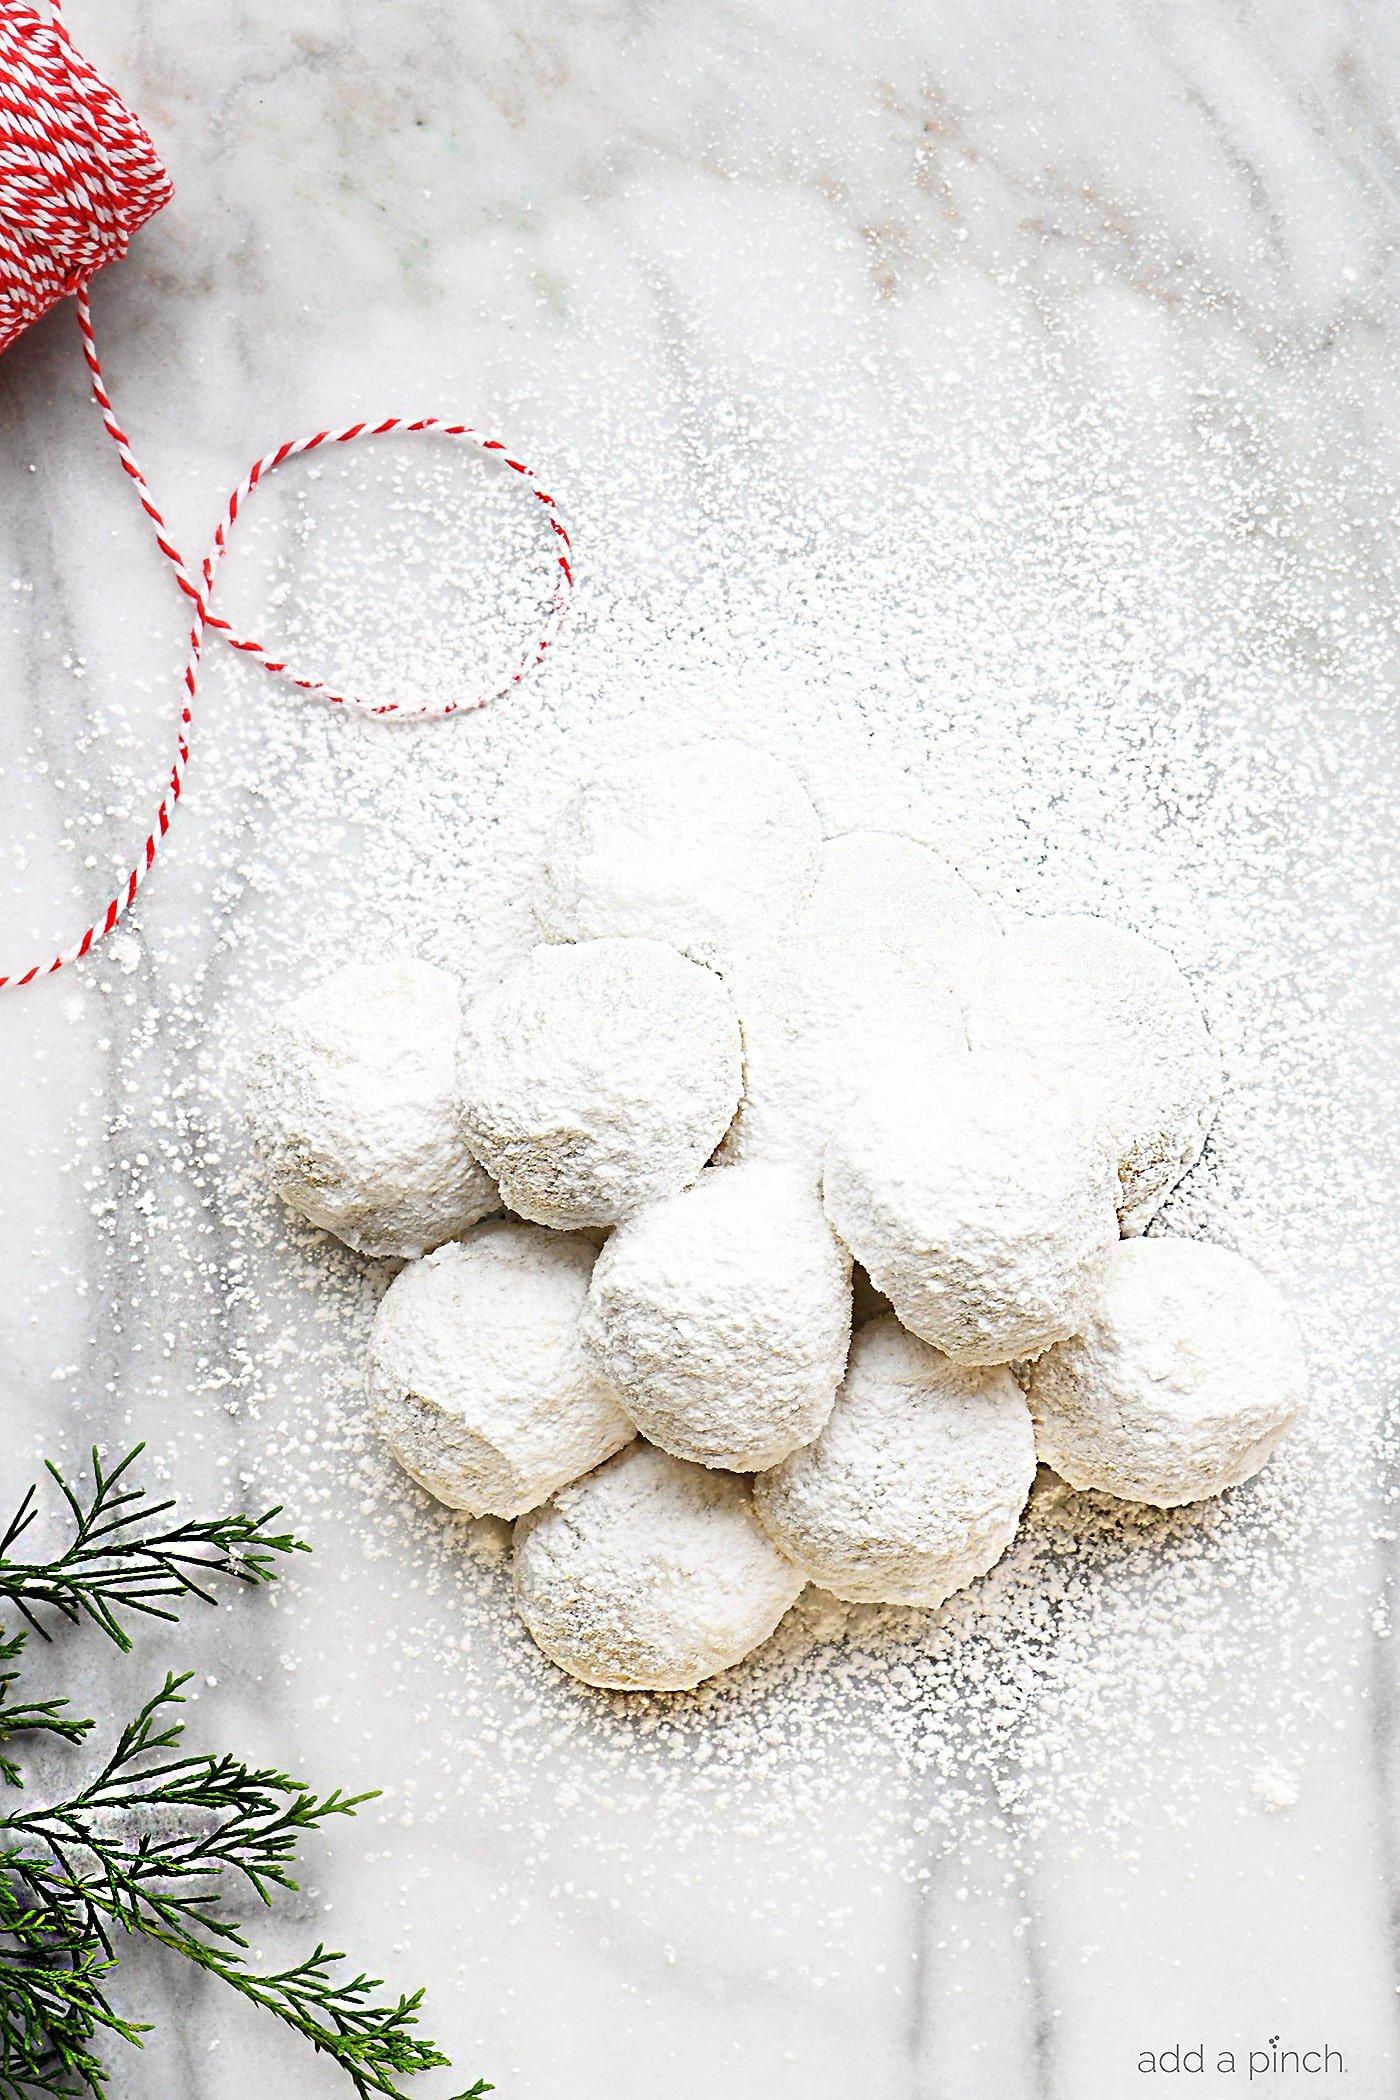 Pecan Sandies Cookie Recipe Mexican Wedding Cookies Add A Pinch